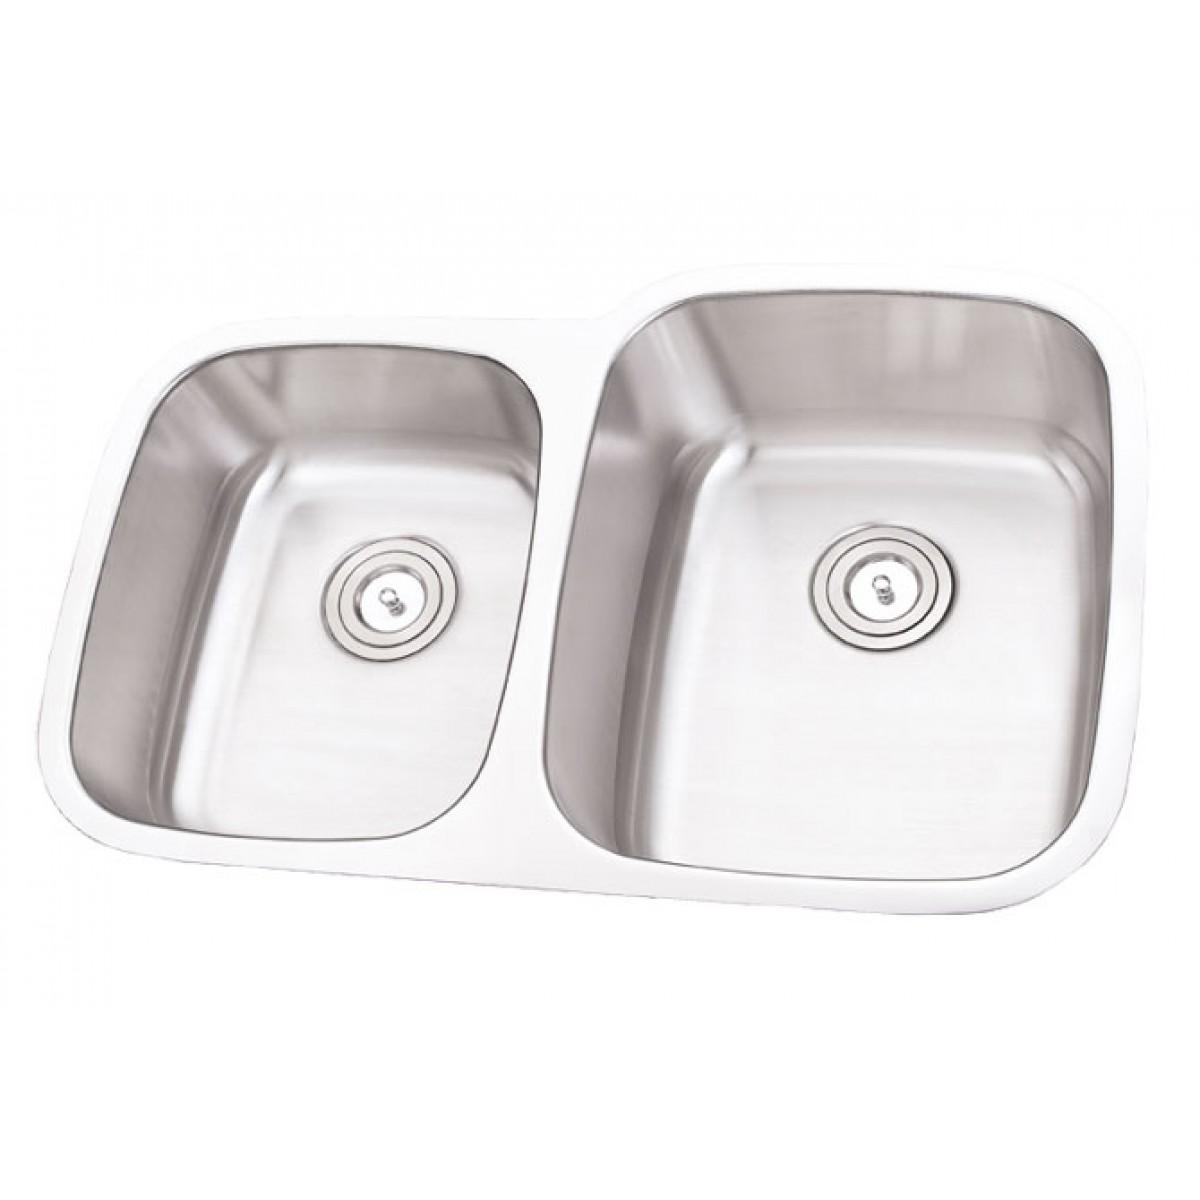 32 inch stainless steel undermount double bowl 40 60 - Stainless steel kitchen sink accessories ...